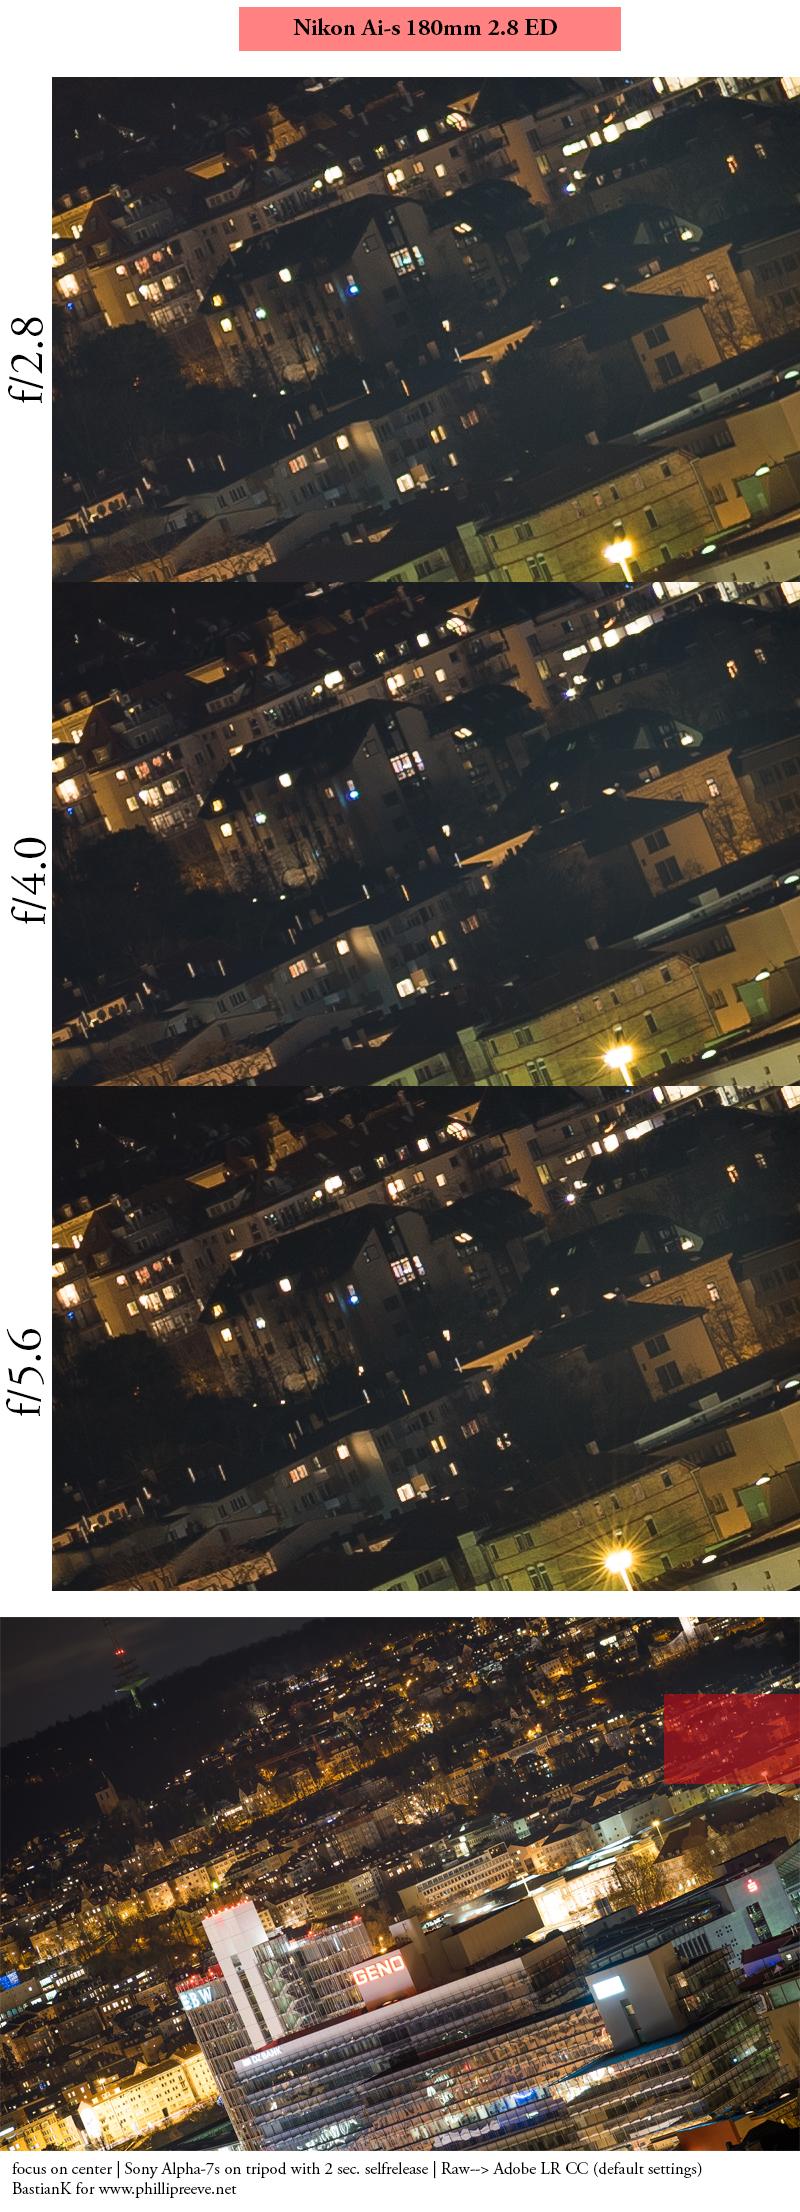 nikon nikkor manual focus ed 180mm ai ais ai-s tele lens fast sony a7r a7 a7ii a7s a7rii mark 2 coma star stars astro astrophotography